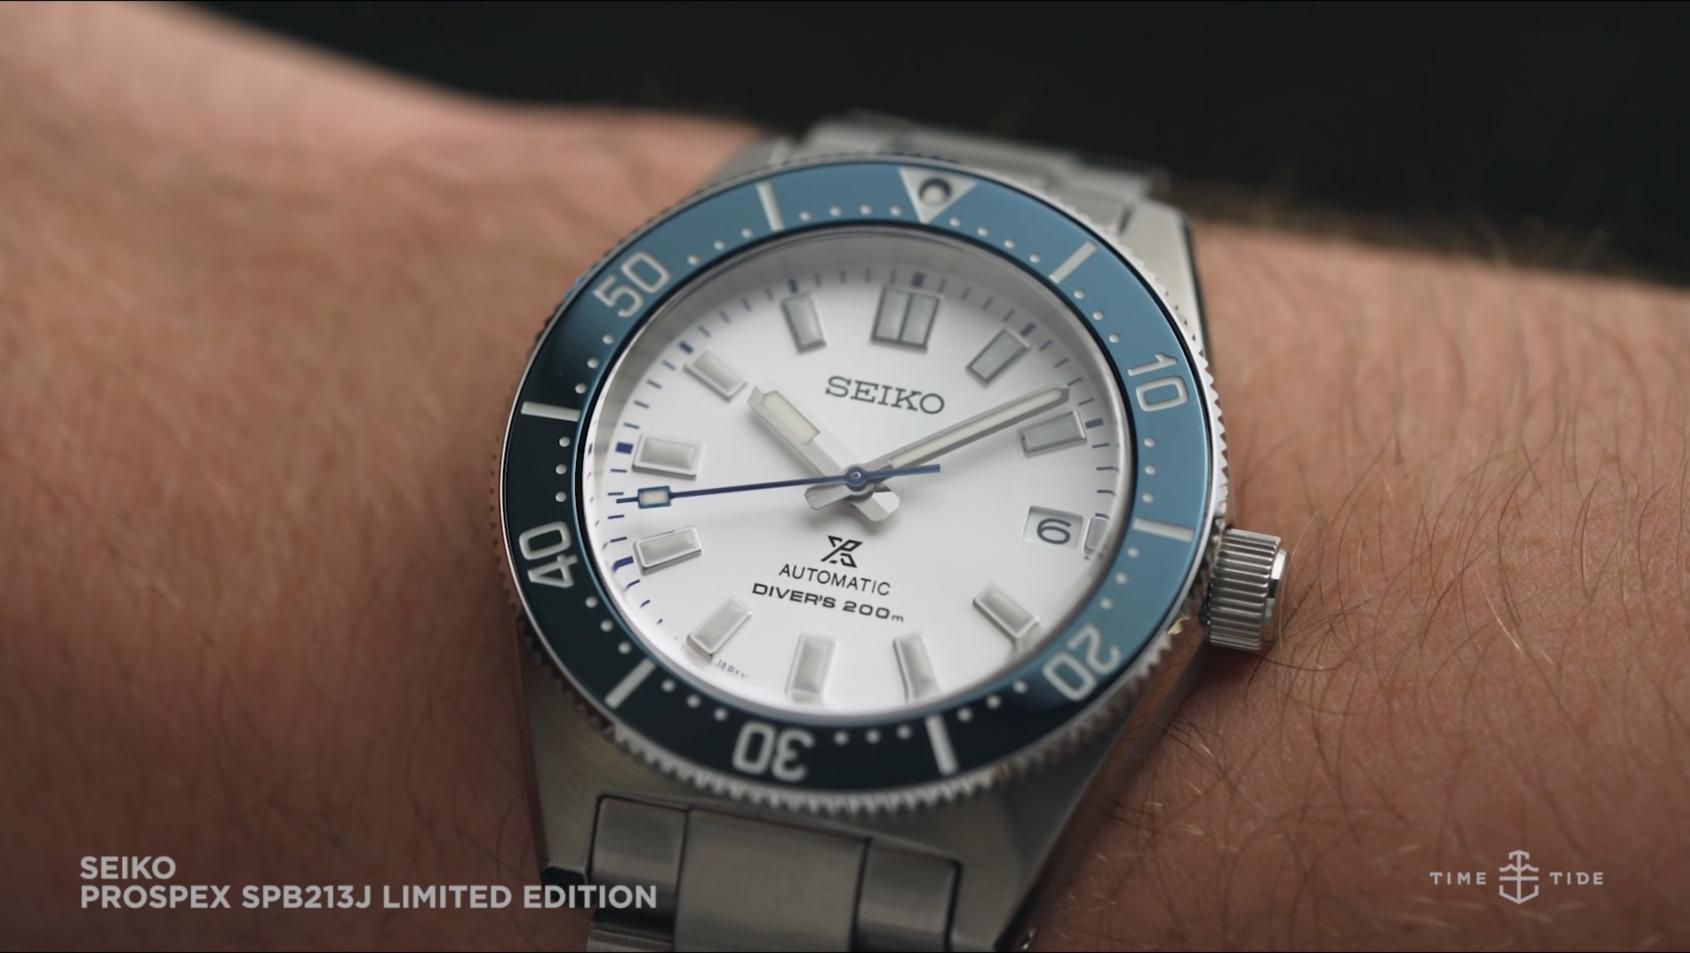 VIDEO: The Seiko Prospex SPB213J1 140th Anniversary is a super-crisp modern diver